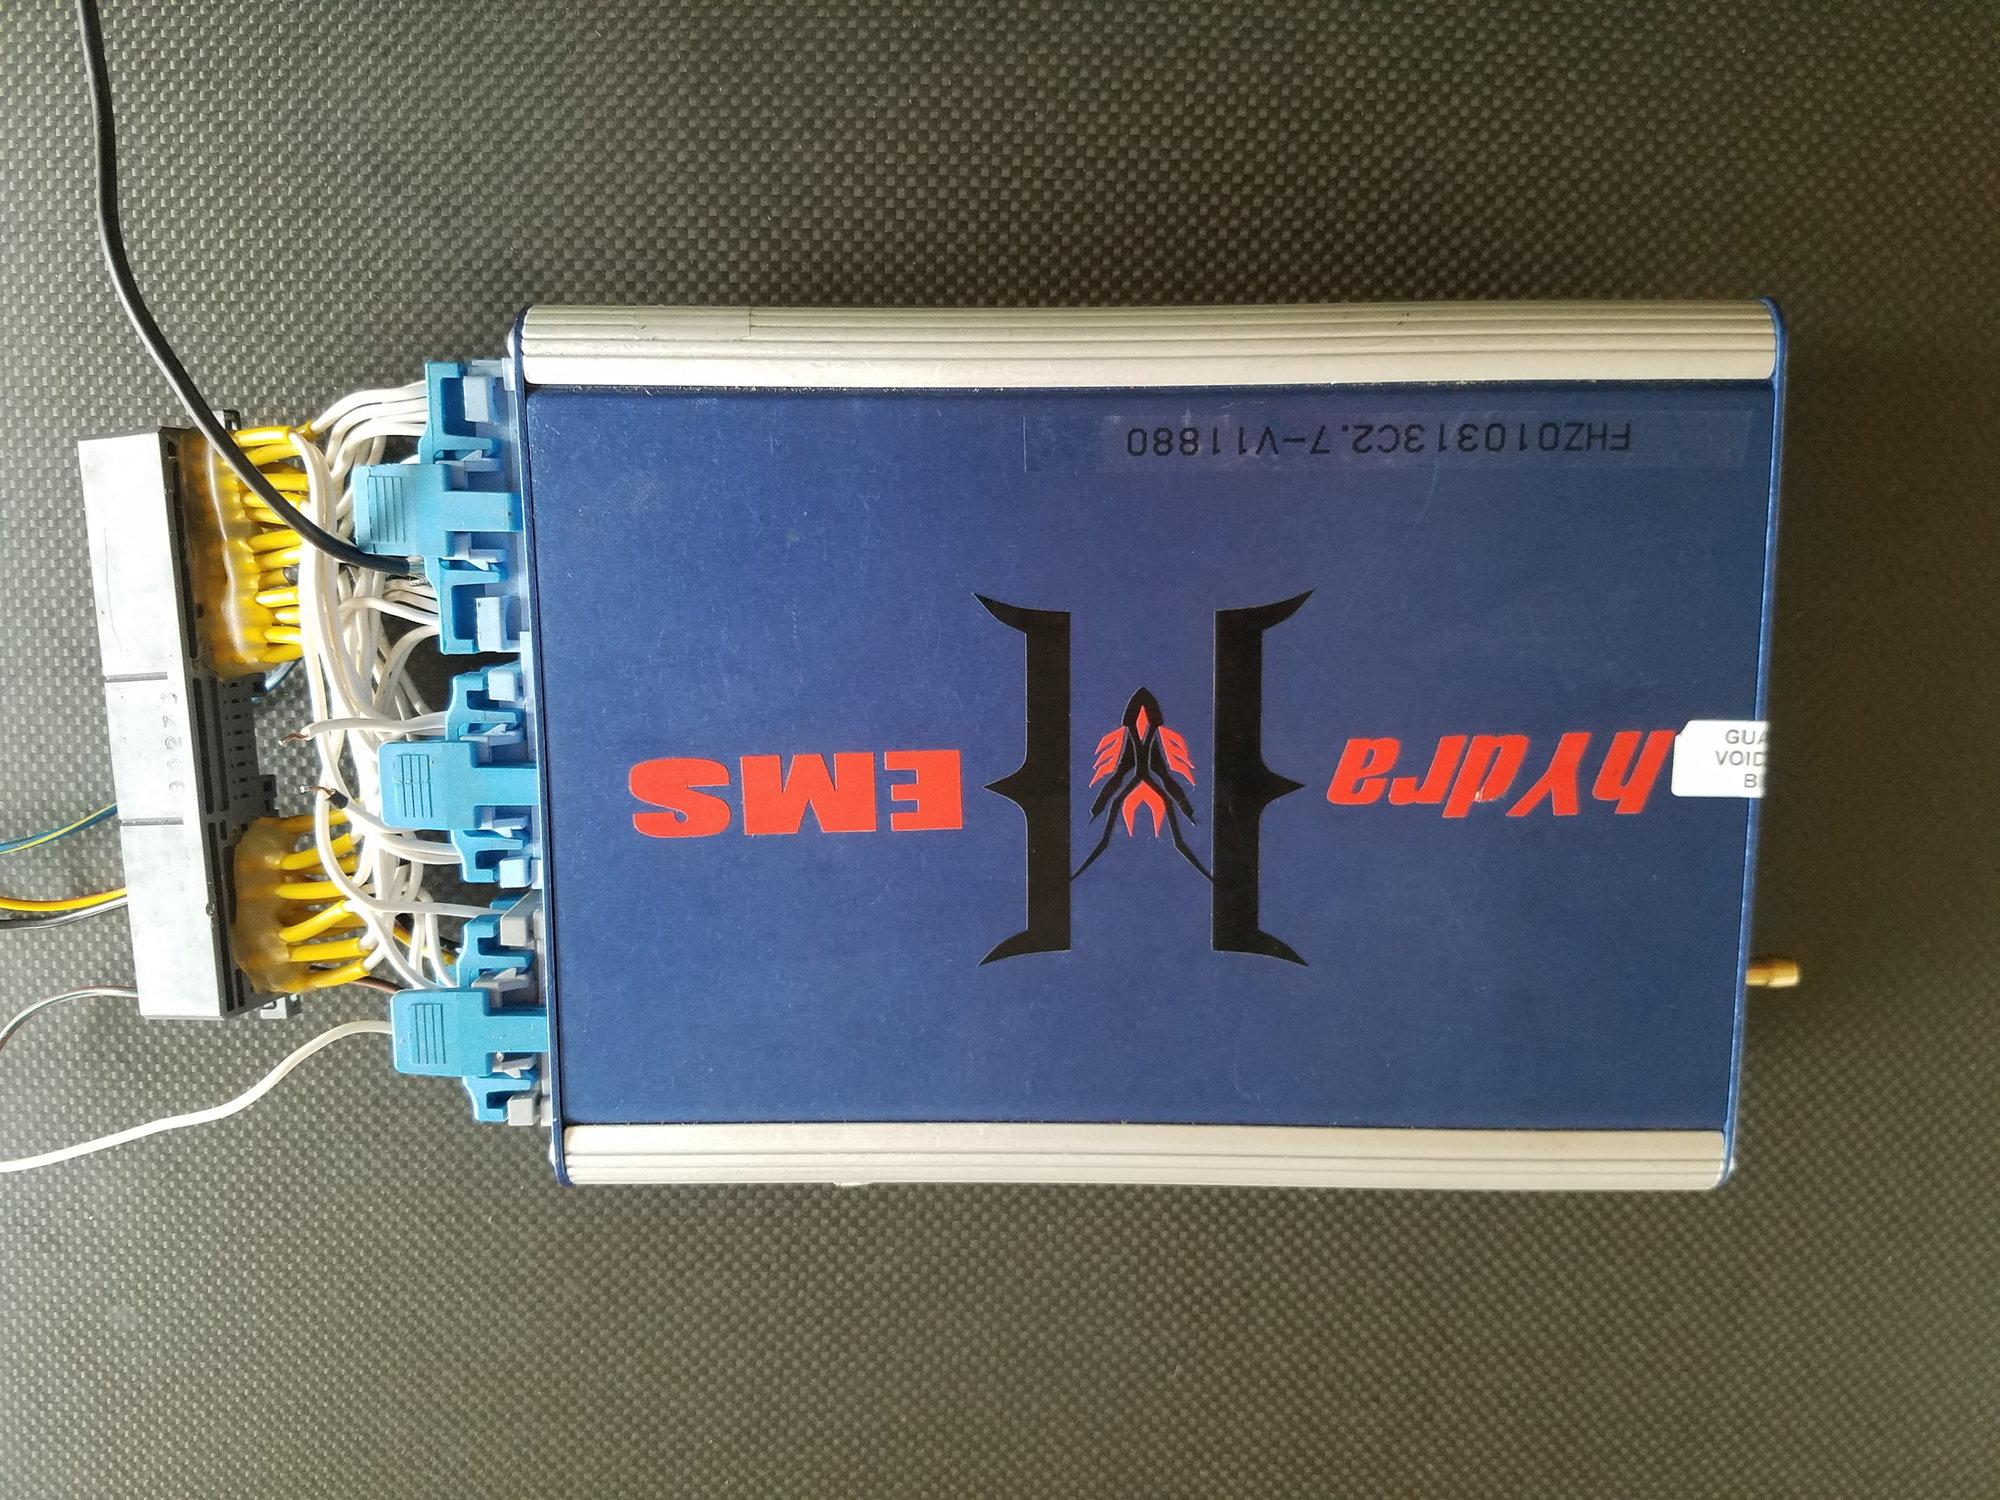 hydra ems wideband tuning